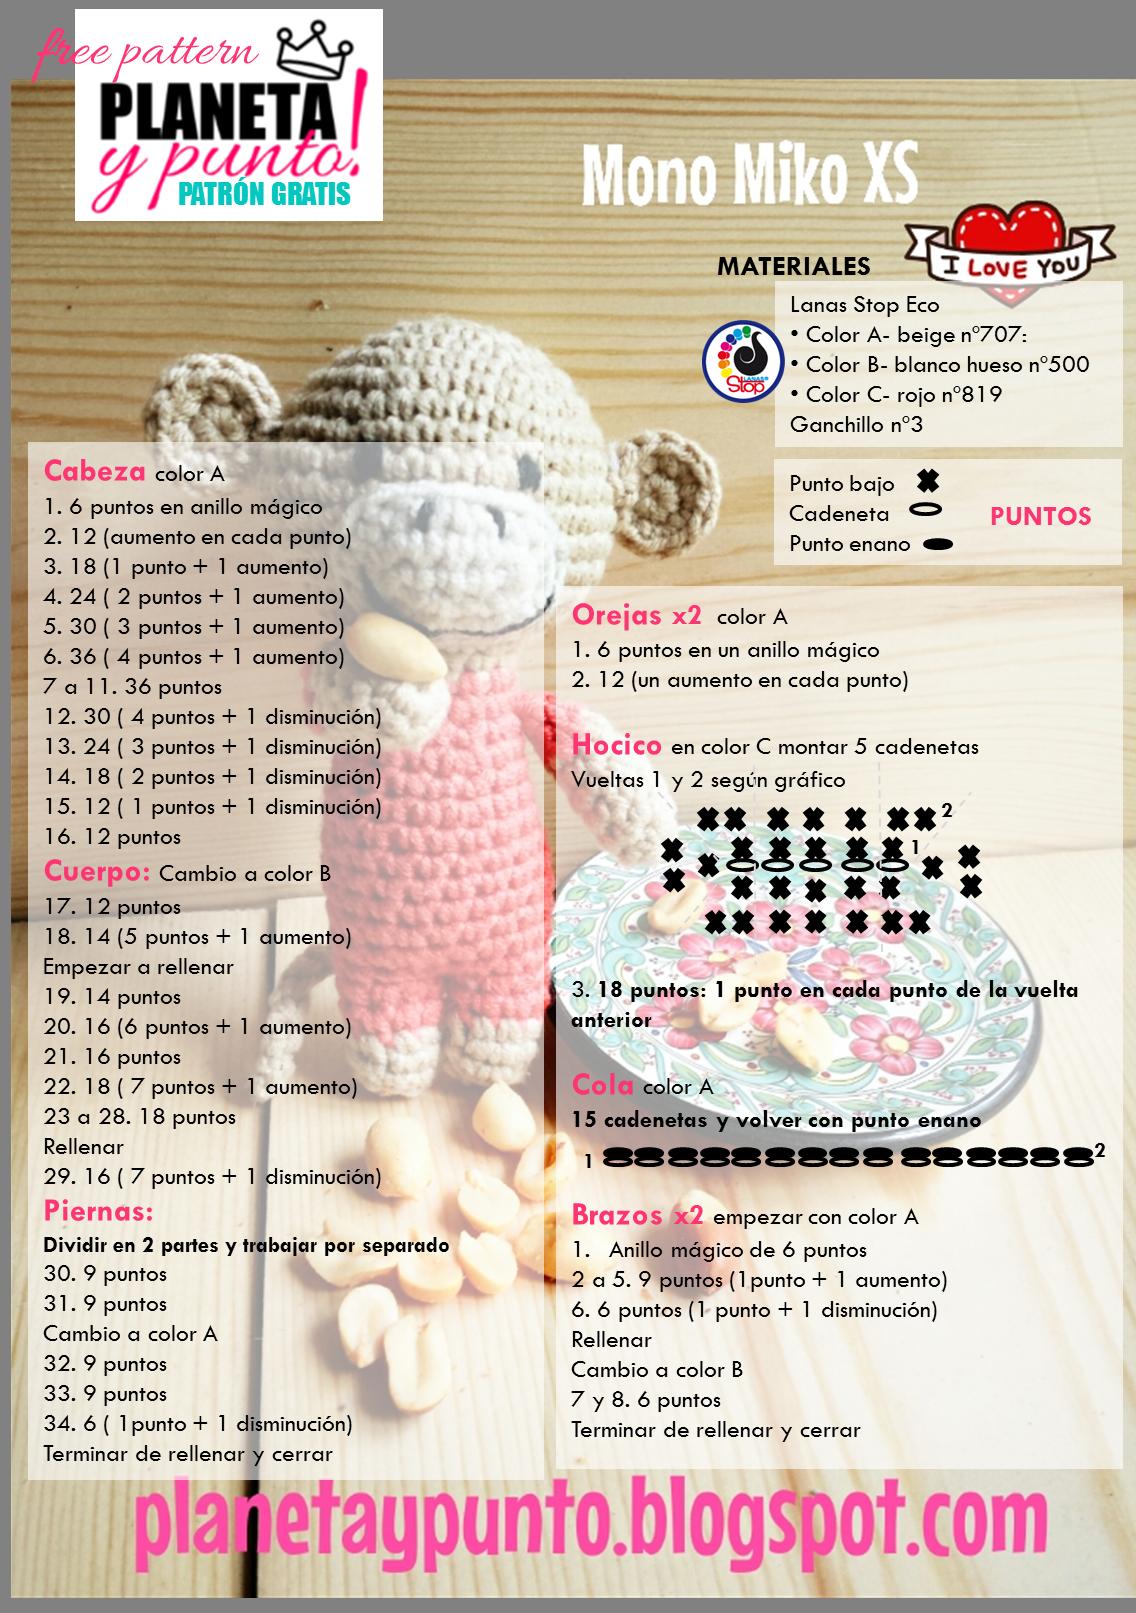 Amigurumi Xxl Patrones Gratis : Patron gratis: amigurumi Mono Miko tamano XS-Free pattern ...